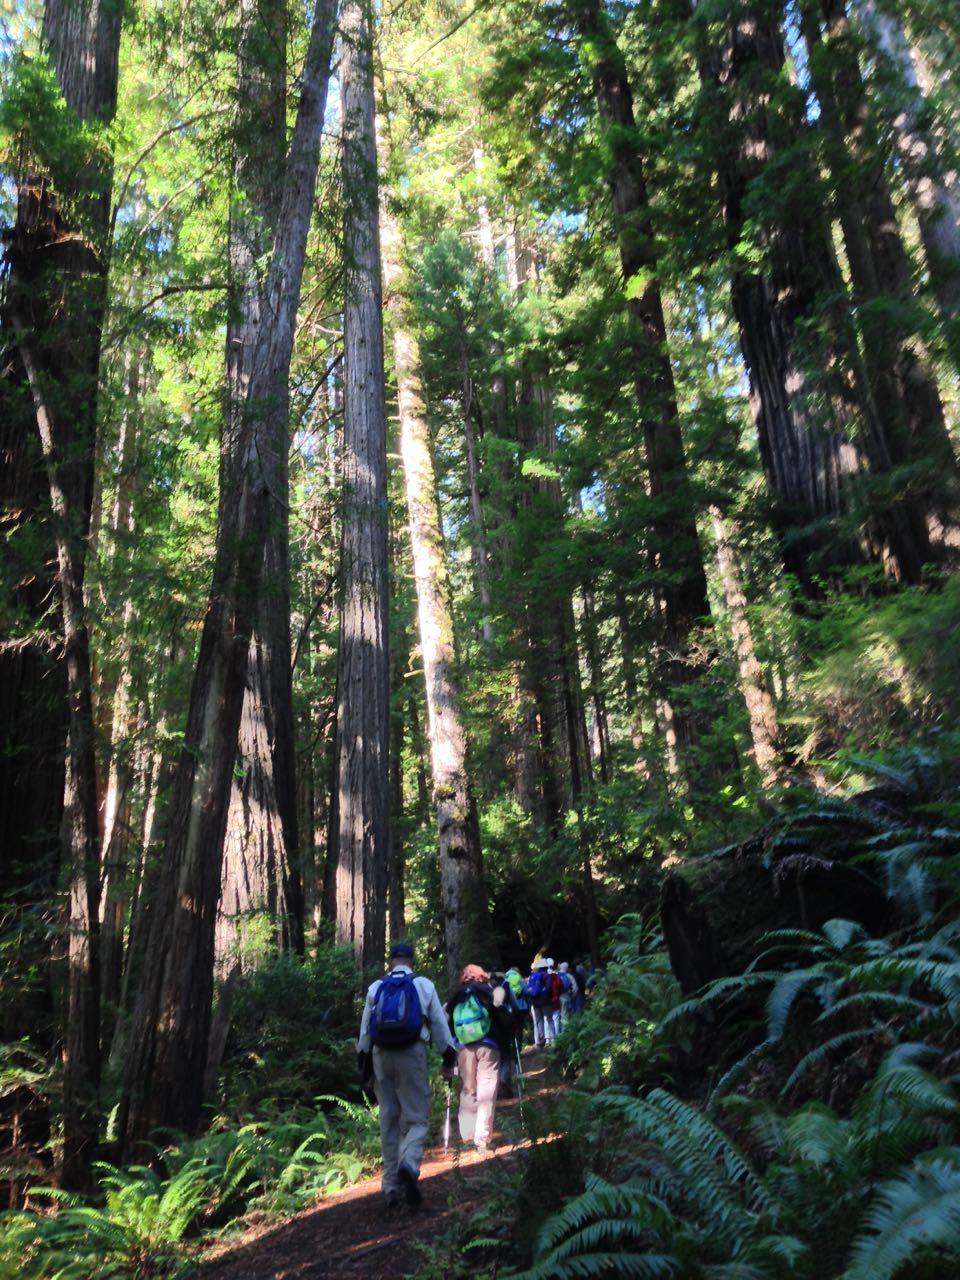 Redwoods 2017 10 08 248 Of 287